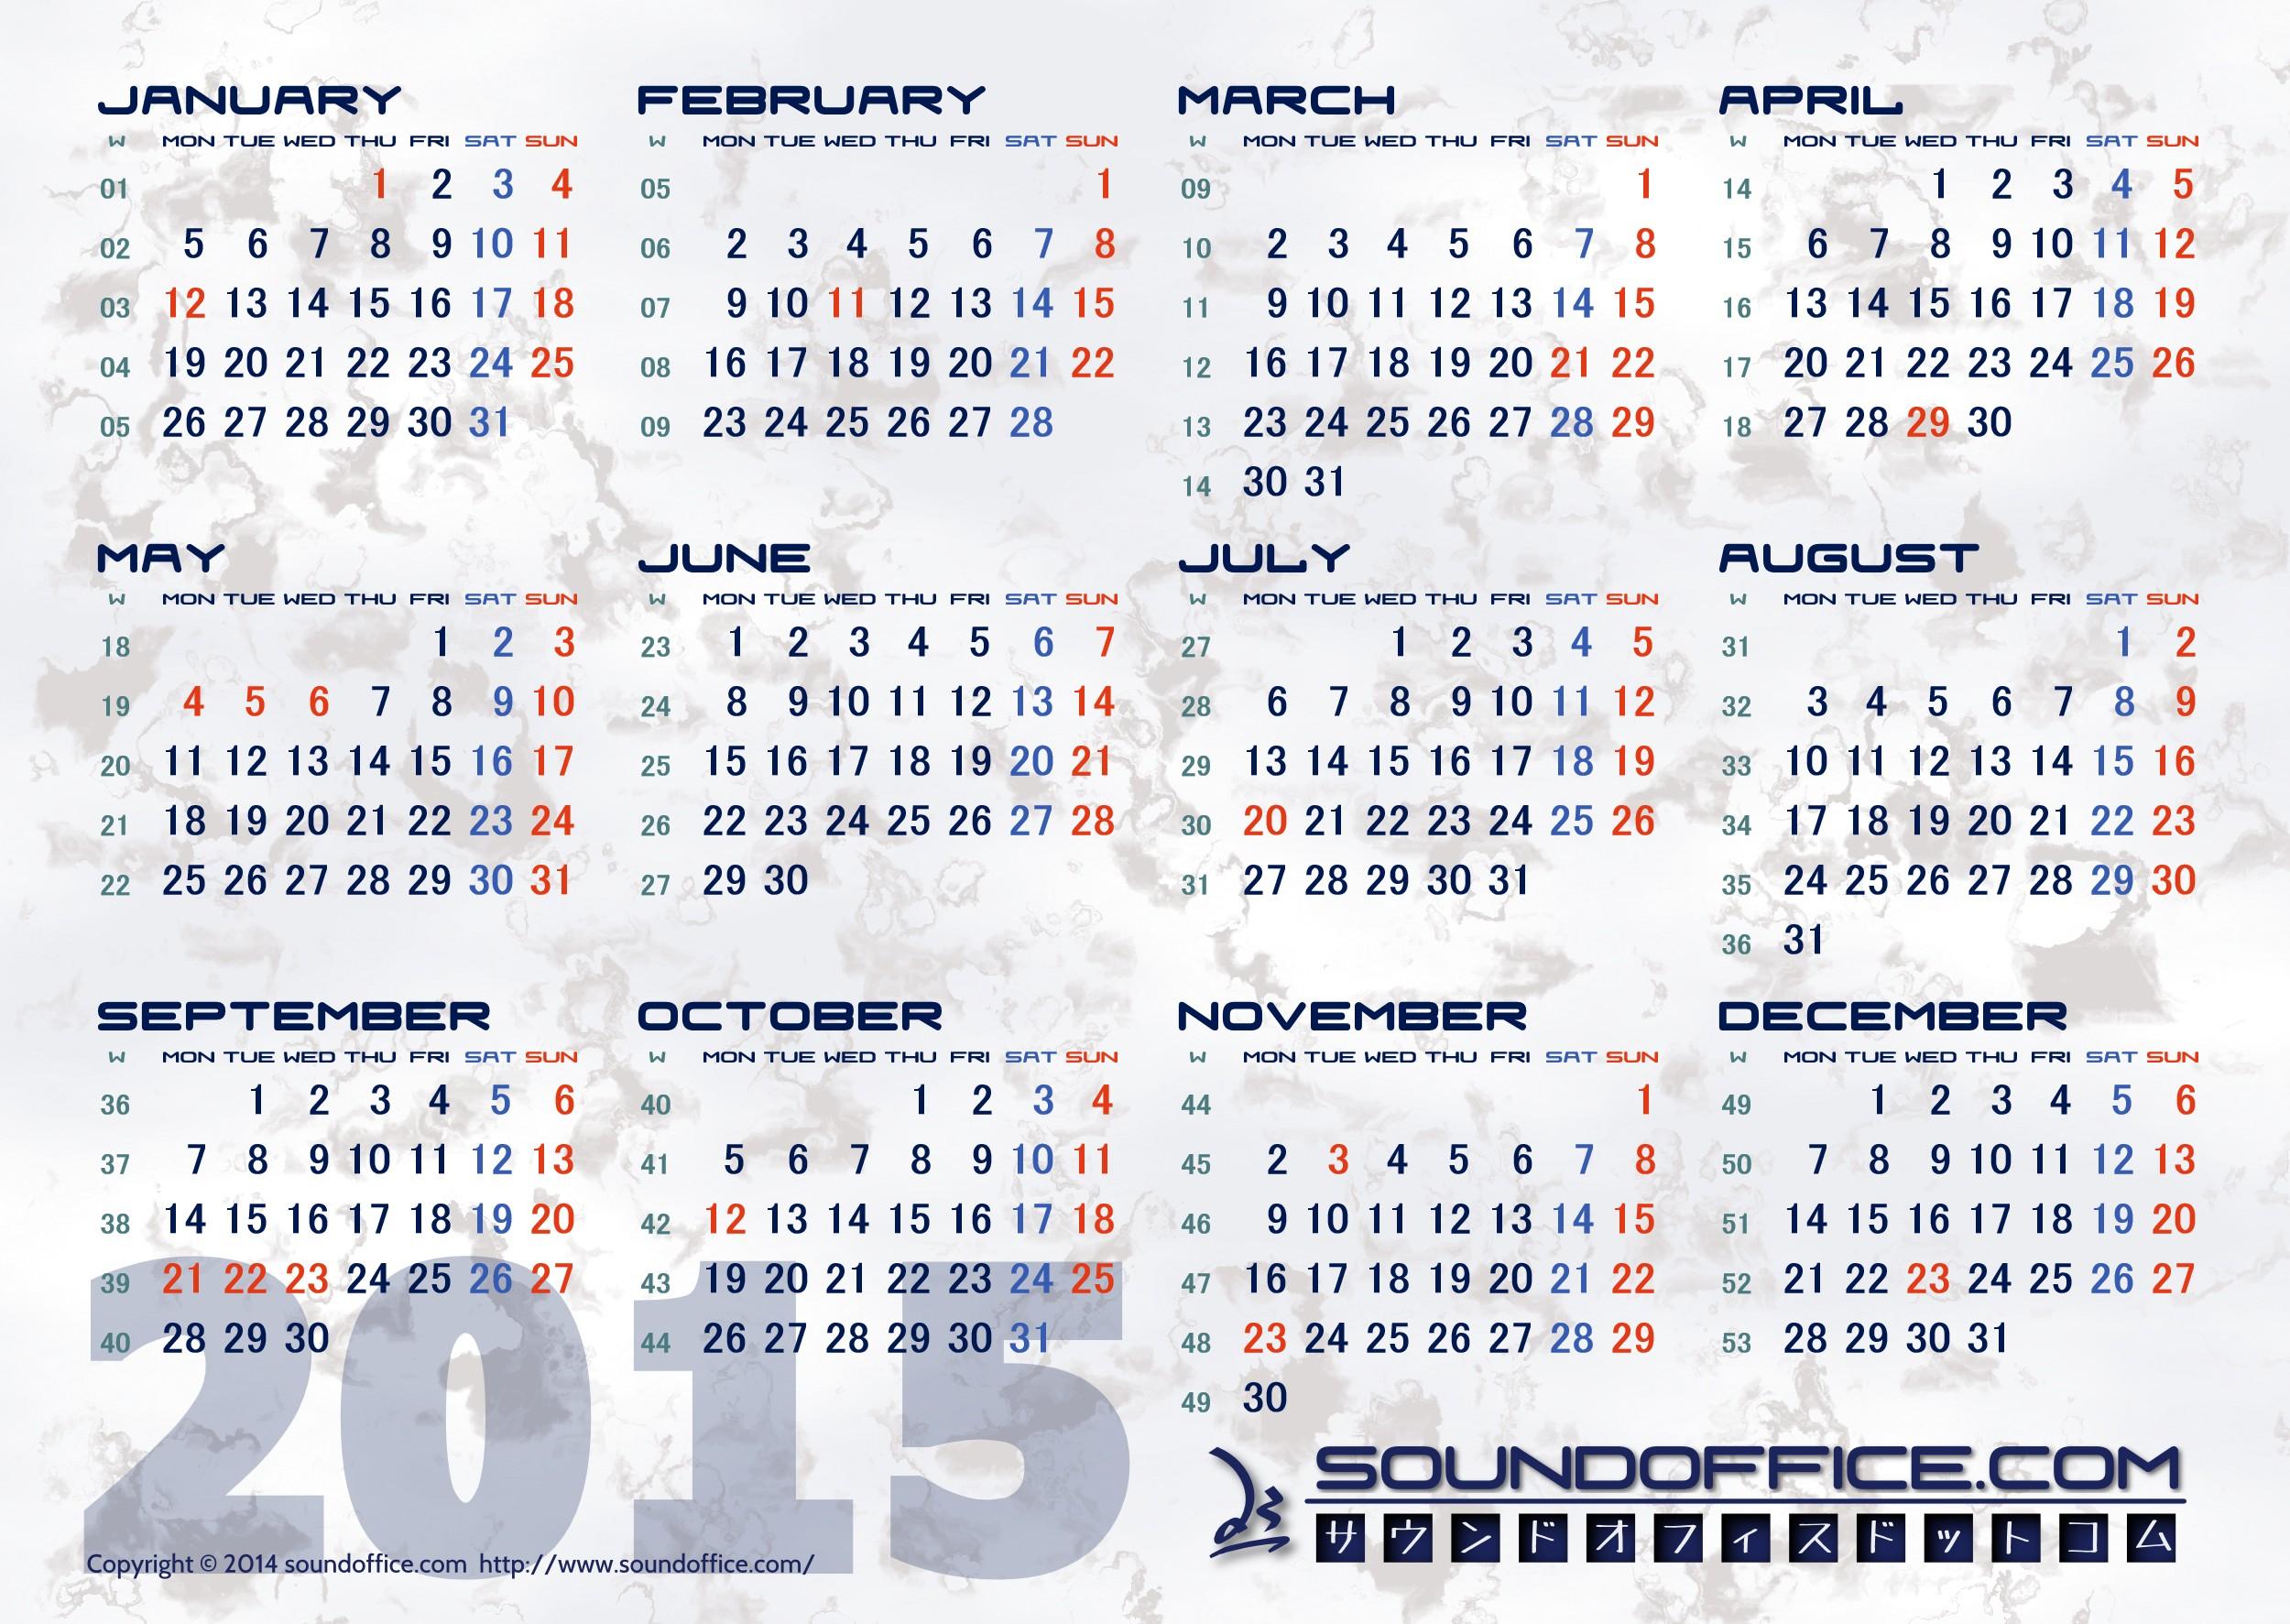 Calendar 2015 Printable Yahoo! : シンプルカレンダー 2014 : カレンダー